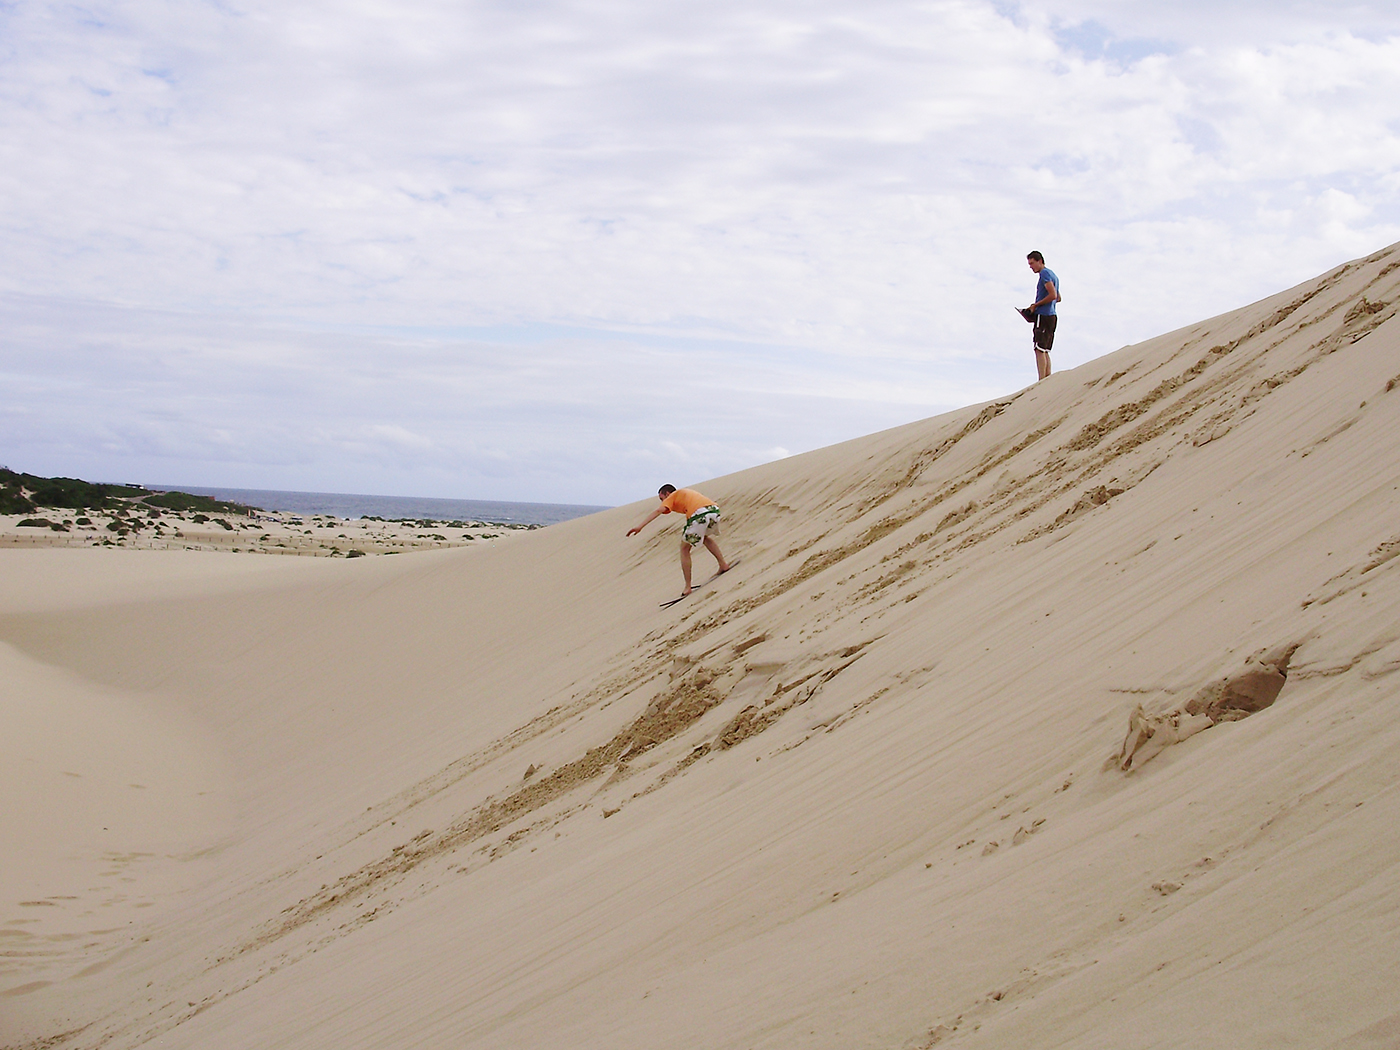 Sandboarden in Port Stephens - activiteiten in Australië